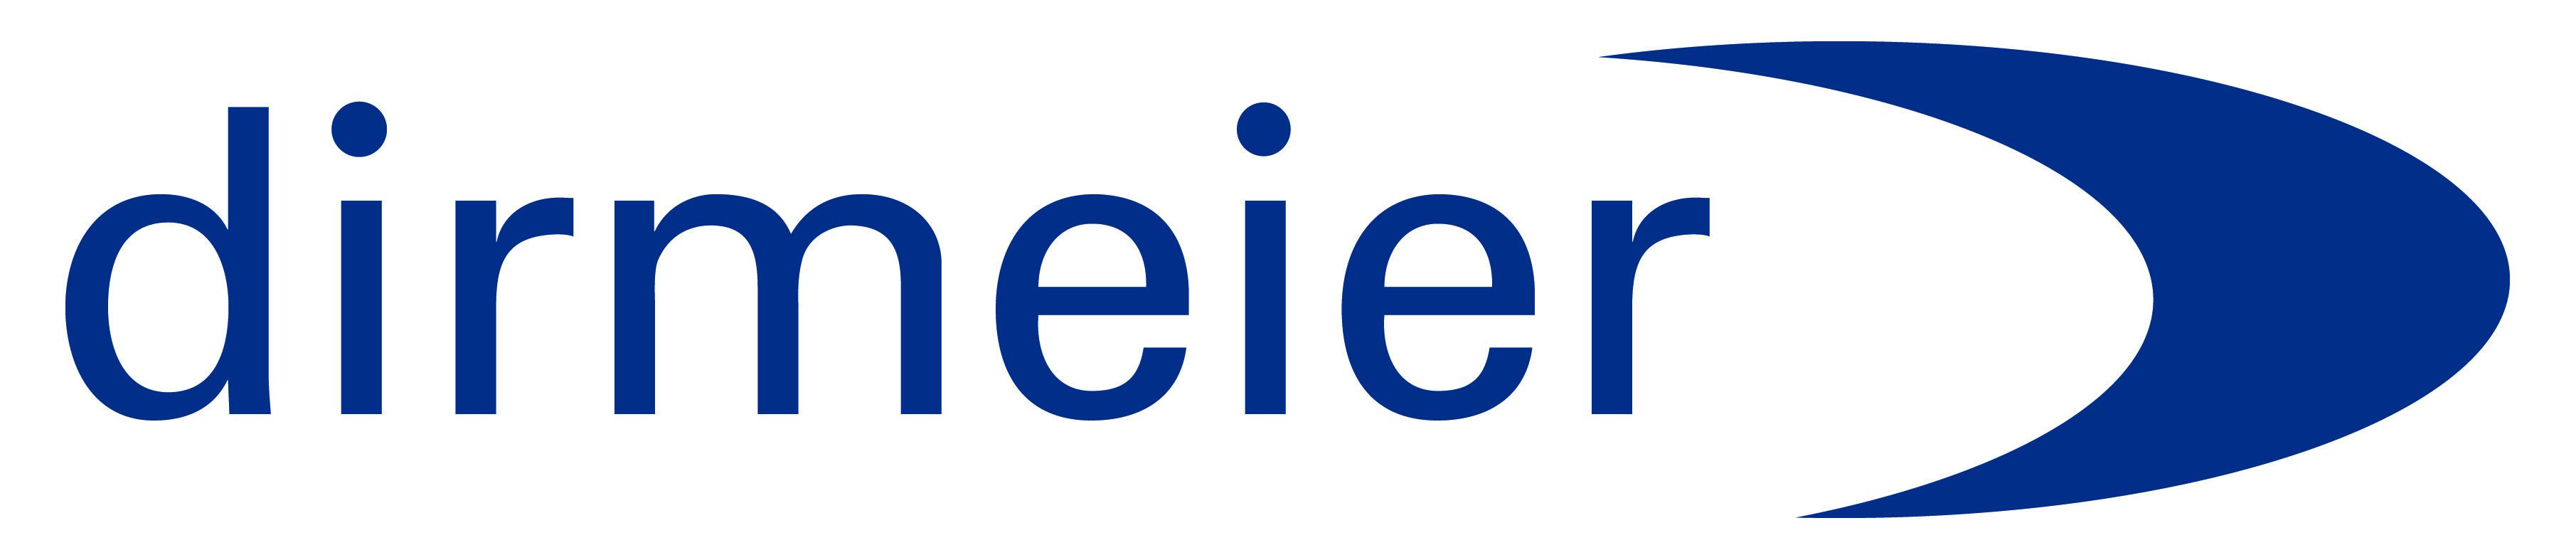 Dirmeier-Logo1806-4c-hd